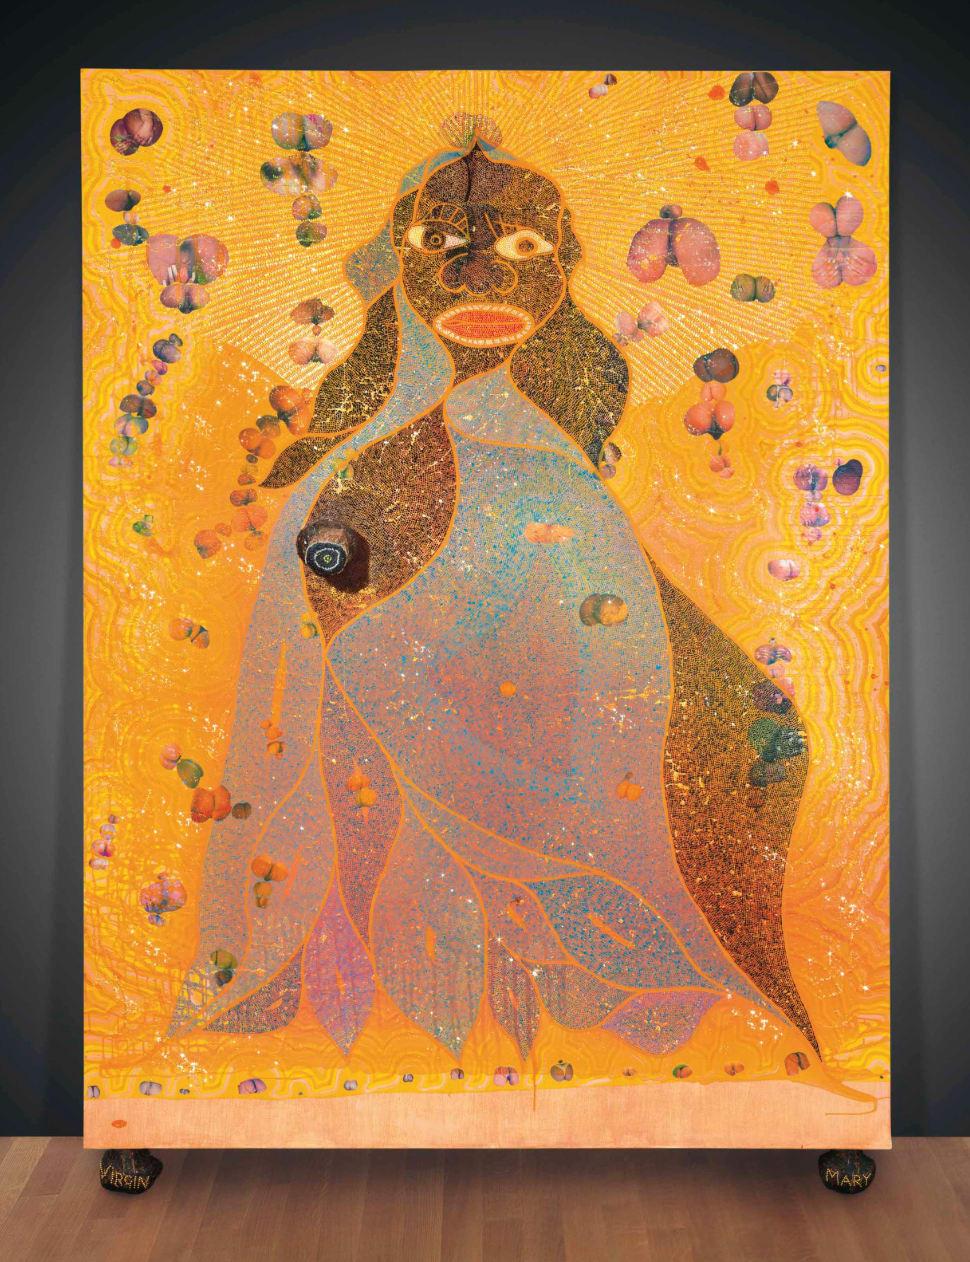 Chris OFILI The Holy Virgin Mary, 1996